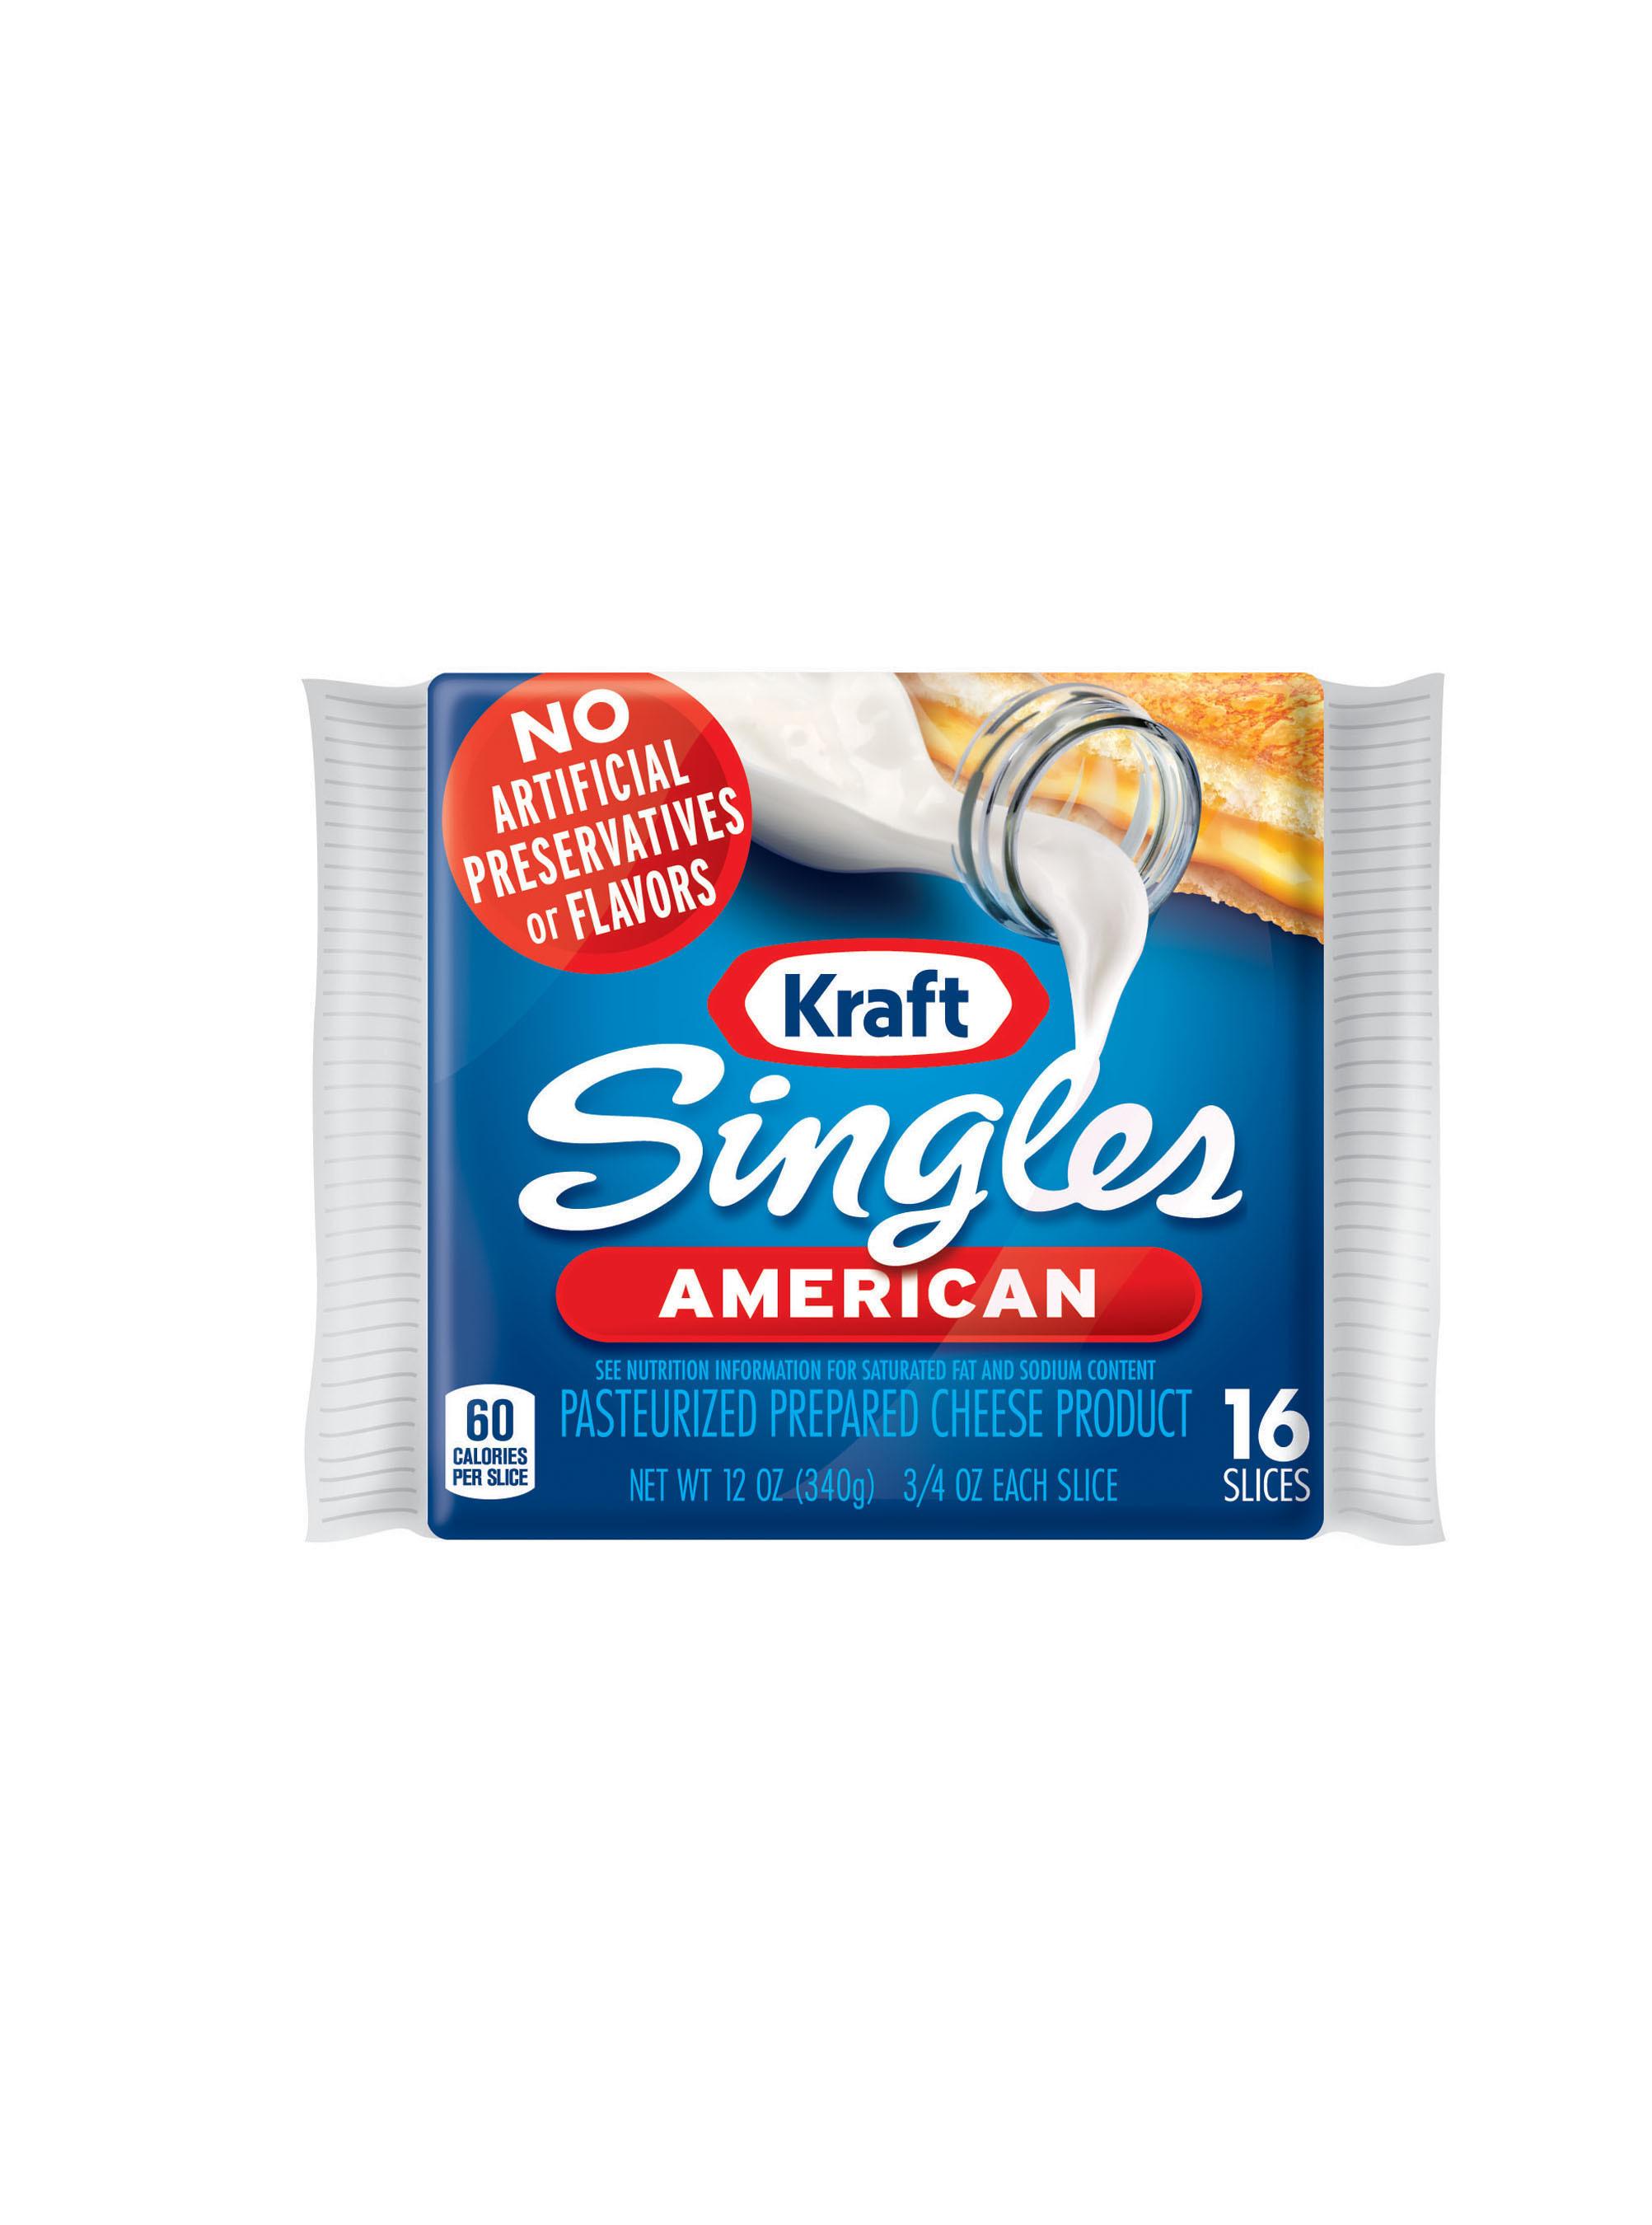 KRAFT Singles now made with No Artificial Preservatives.  (PRNewsFoto/Kraft Foods Group, Inc.)